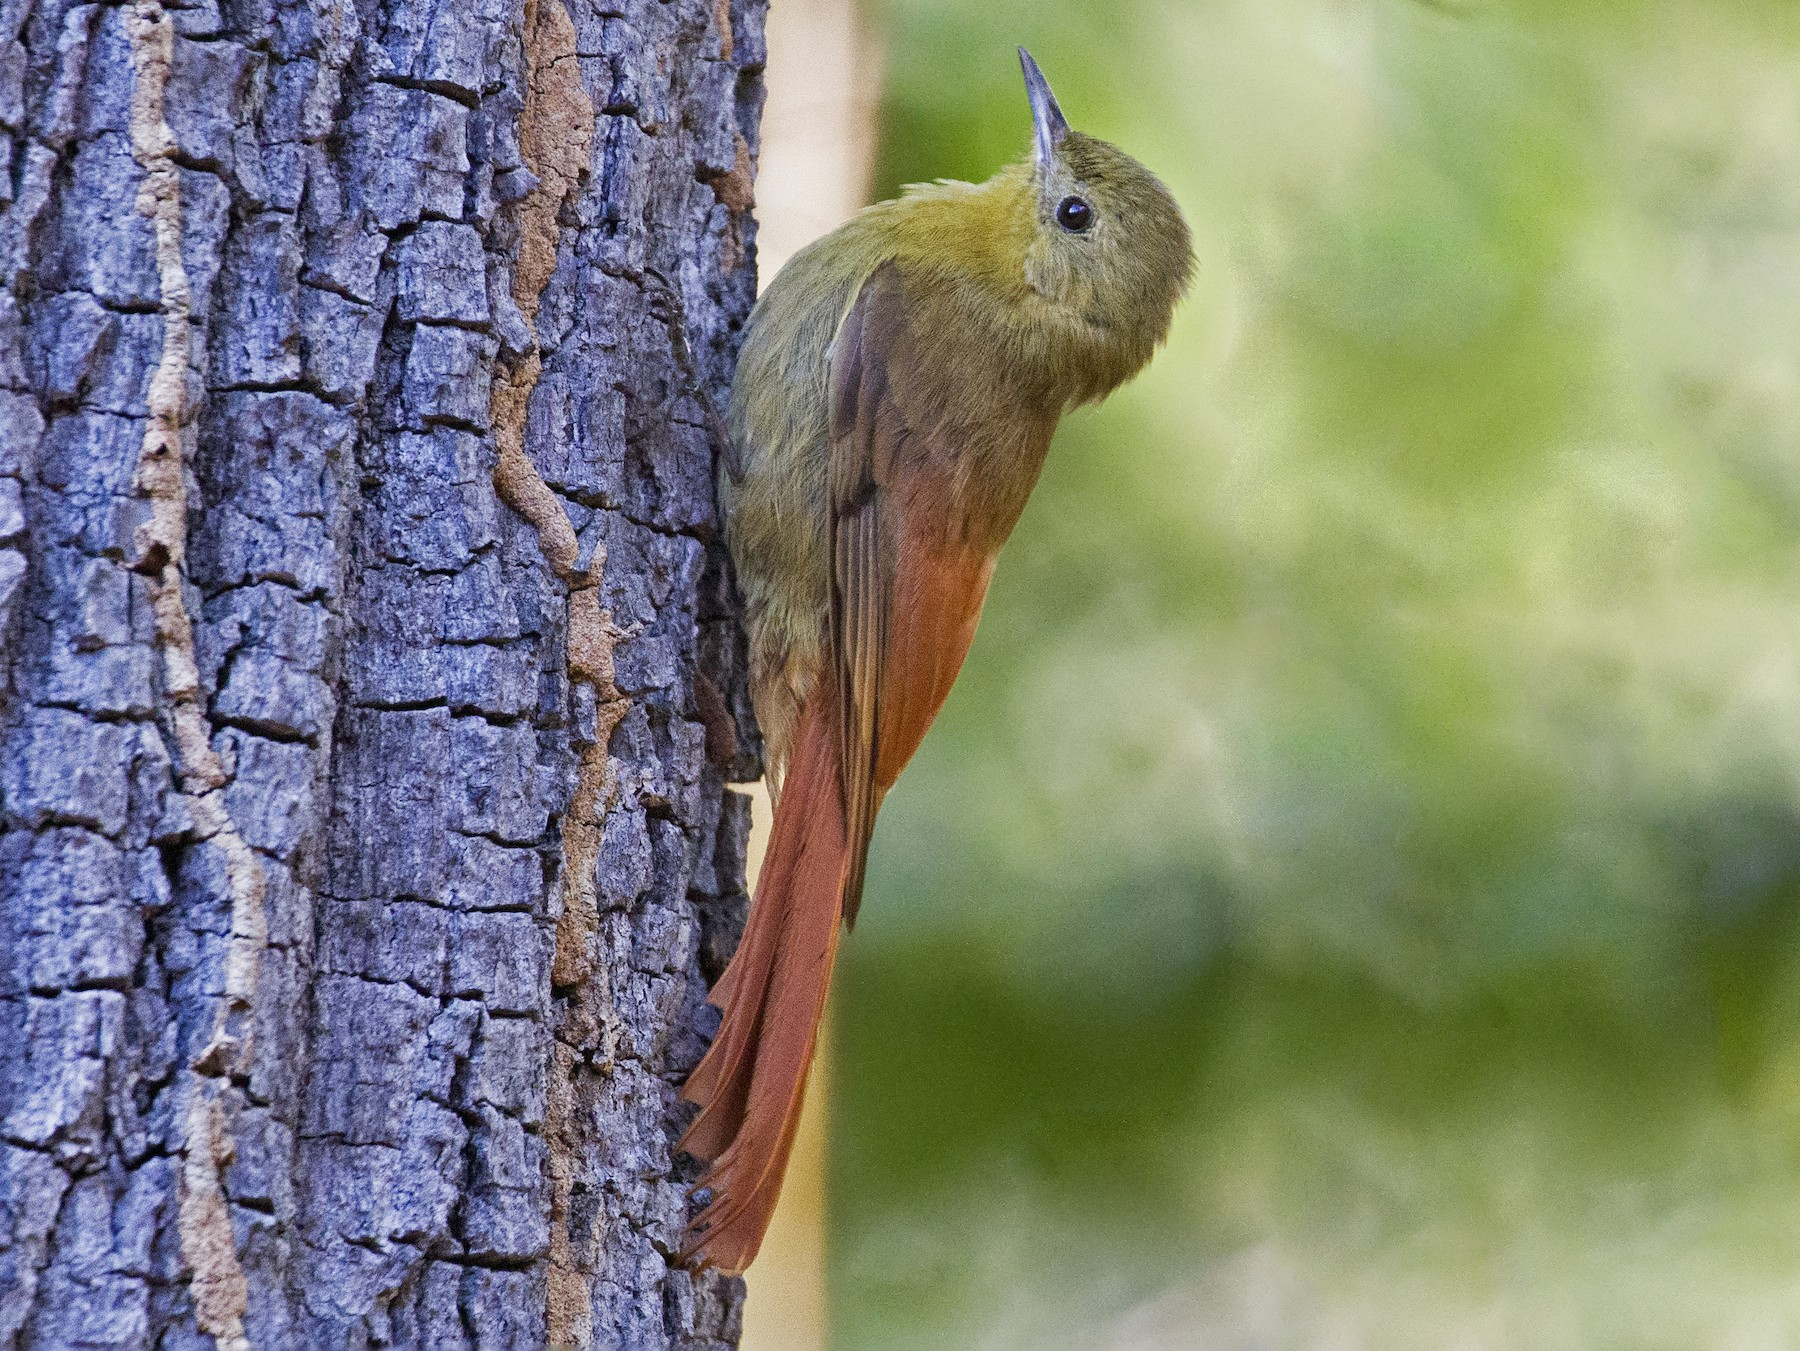 Olivaceous Woodcreeper - Cristine Prates